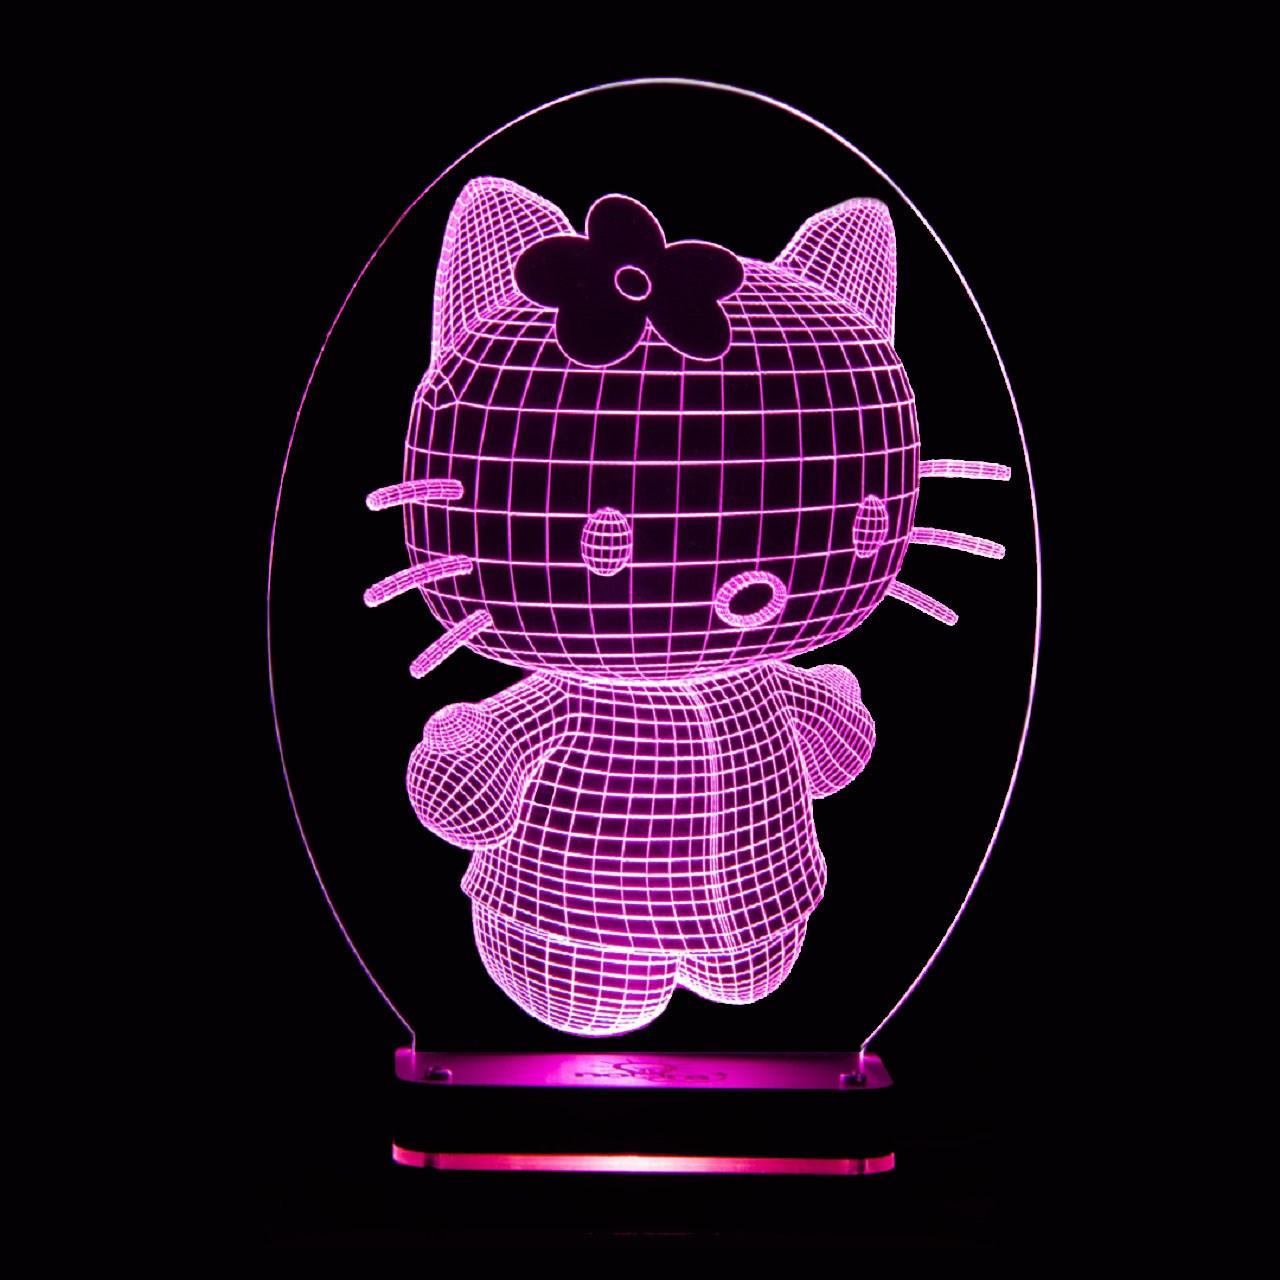 چراغ خواب سه بعدی نورا مدل کیتی